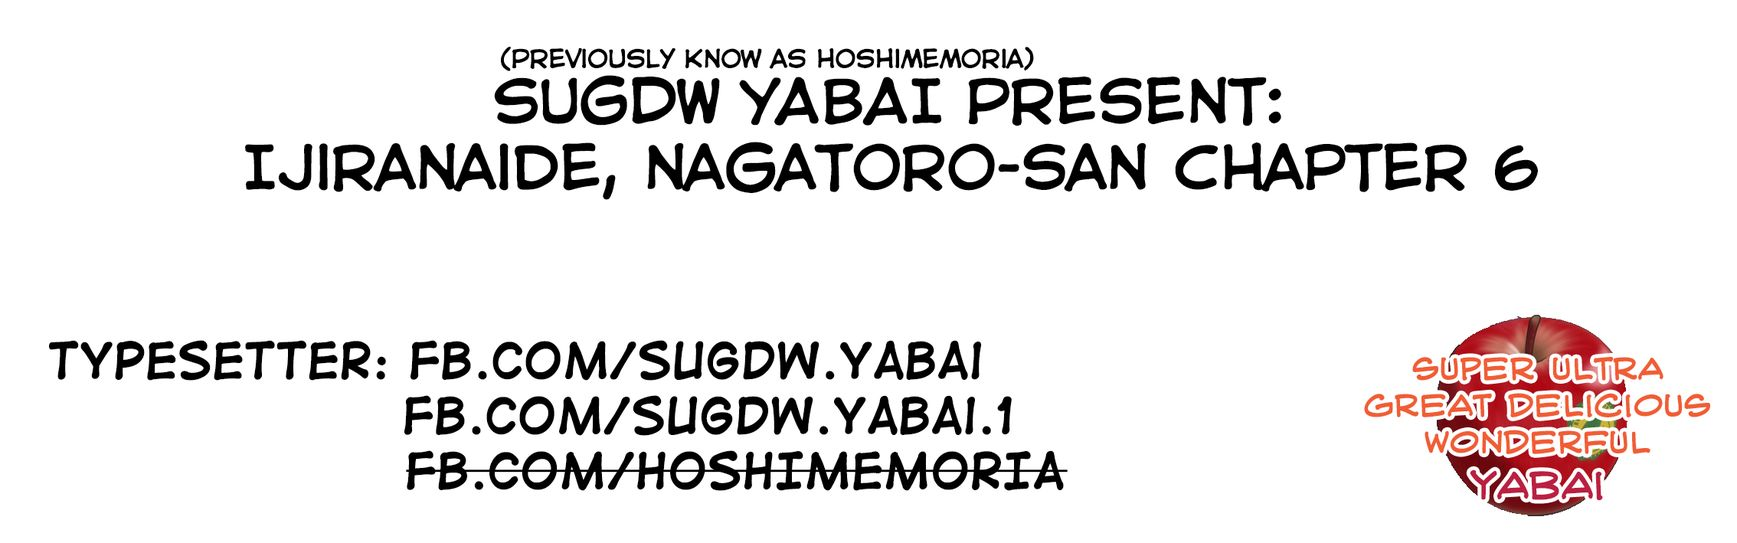 nagatoro san, nagatoro san manga, Don't Toy With Me, Miss Nagatoro, nagatoro san mal, nagatoro san age, nagatoro san characters, nagatoro san anime announcement, nagatoro san wiki, nagatoro san reddit, nagatoro san chapter 1, nagatoro san tv tropes, ijiranaide nagatoro-san trailer, ijiranaide nagatoro-san episode 1, manga similar to nagatoro san, ijiranaide nagatoro-san manga livre, ijiranaide nagatoro-san anime announcement, ijiranaide nagatoro-san artist, don't bully me nagatoro-san anime, ijiranaide nagatoro-san capitulo 1, please don't bully me nagatoro san anime, ijiranaide nagatoro-san capitulo, ijiranaide nagatoro-san português union, ijiranaide nagatoro-san important announcement, ijiranaide nagatoro-san capitulo 67, don't bully me nagatoro mangadex, nagatoro reddit, nanashi, nagatoro mal, devilchi, don't bully me nagatoro japanese name, nagatoro age, nagatoro pfp, please don t bully me nagatoro 3, nagatoro smu